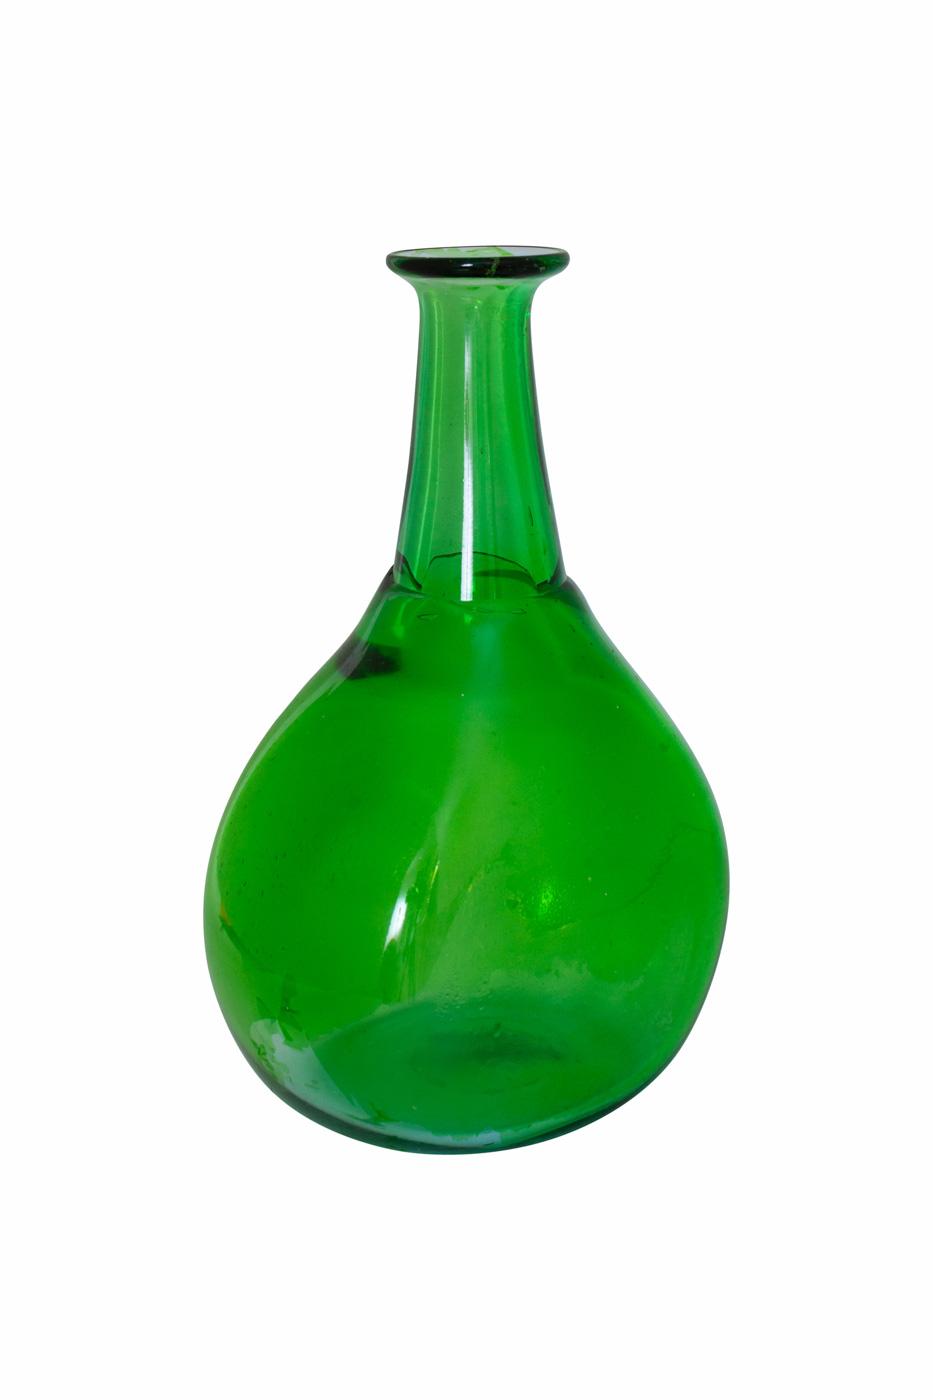 Botella decorativa de vidrio verde